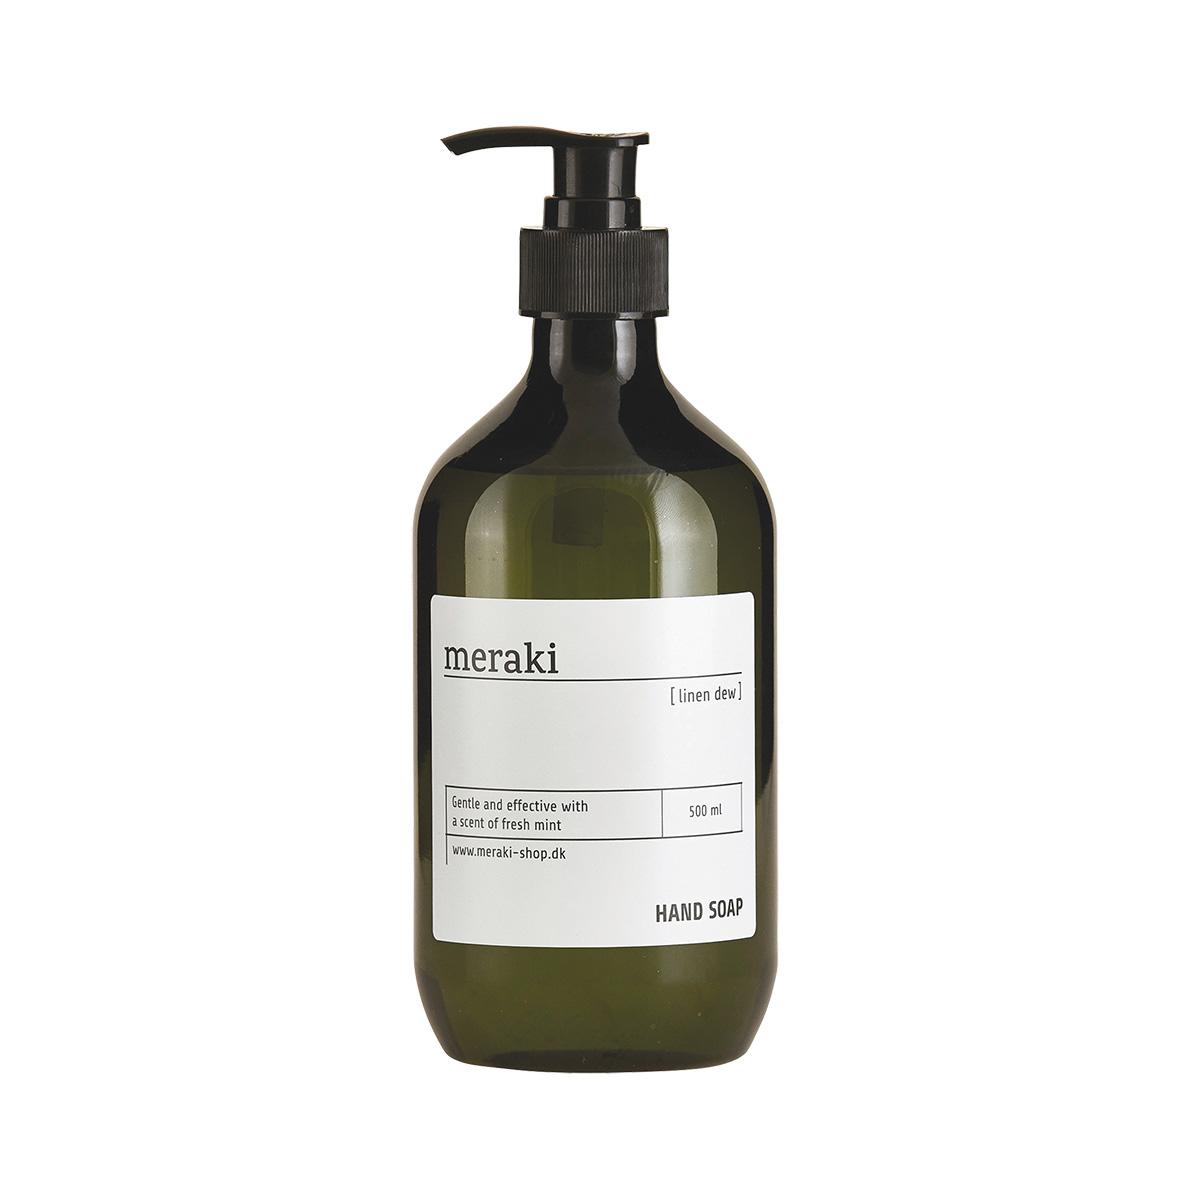 Image of   Meraki Håndsæbe, Linen dew, 500 ml.